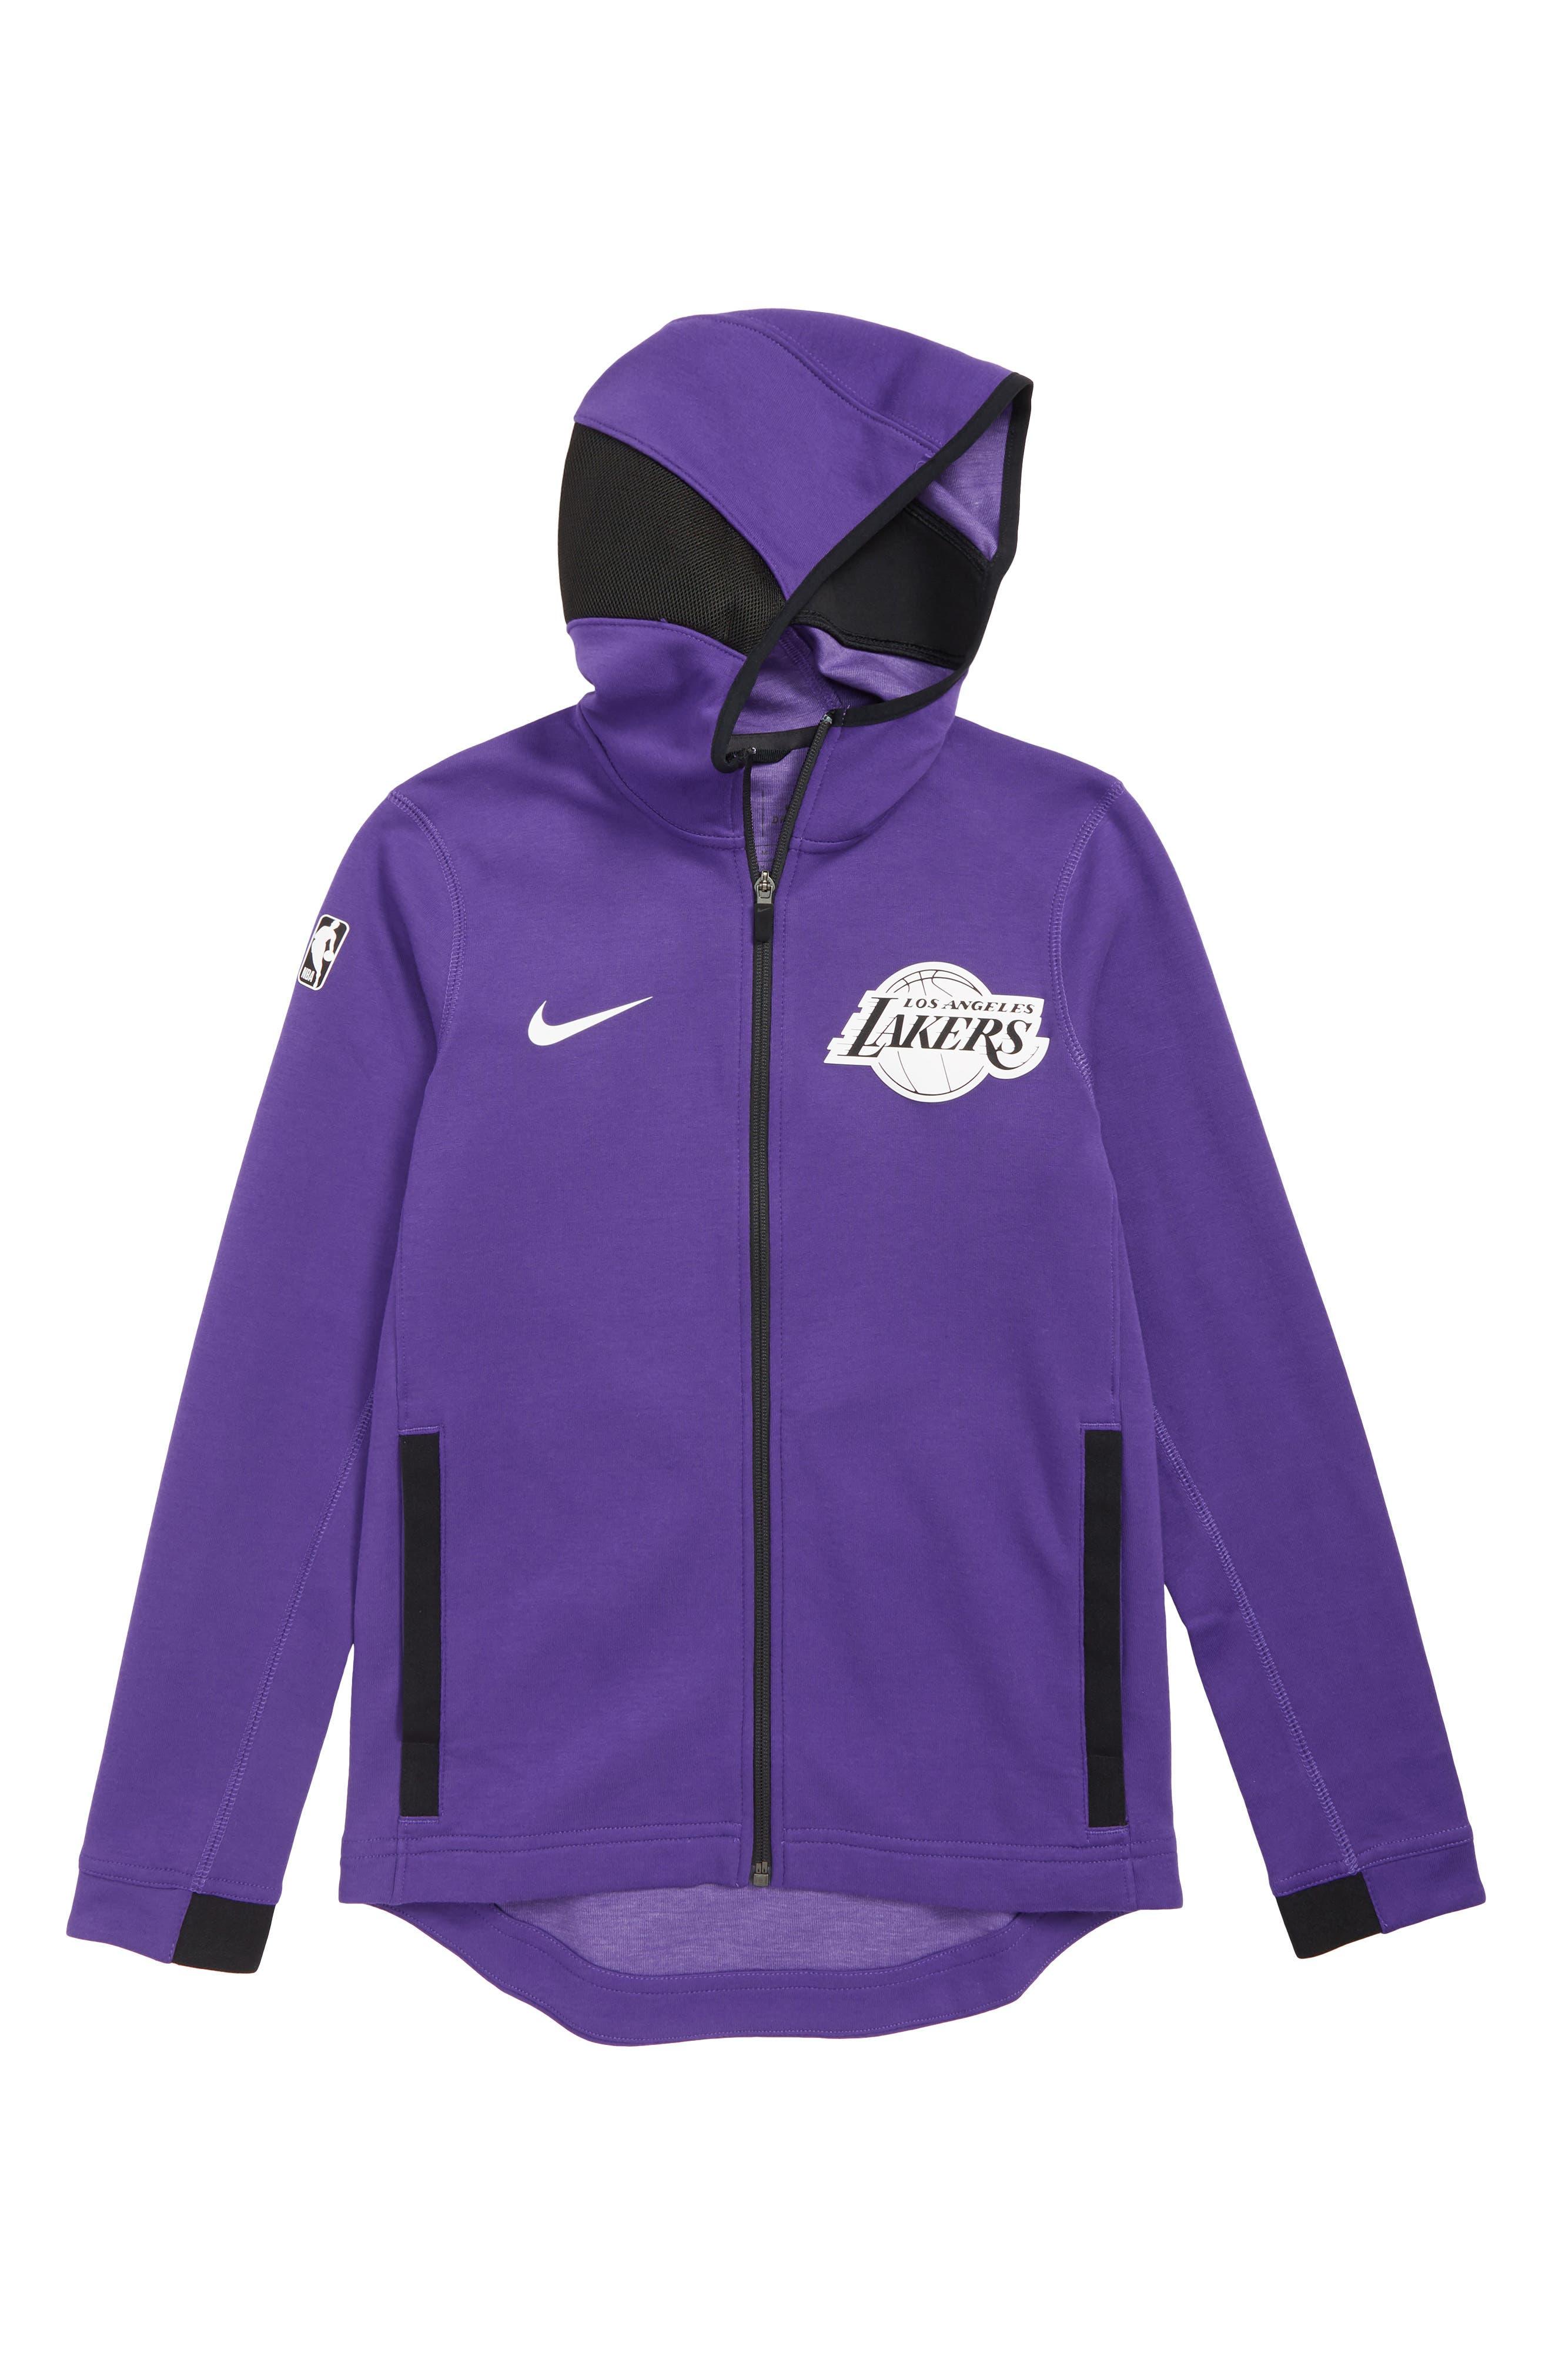 NIKE Los Angeles Lakers Showtime Dri-FIT Hoodie, Main, color, PURPLE